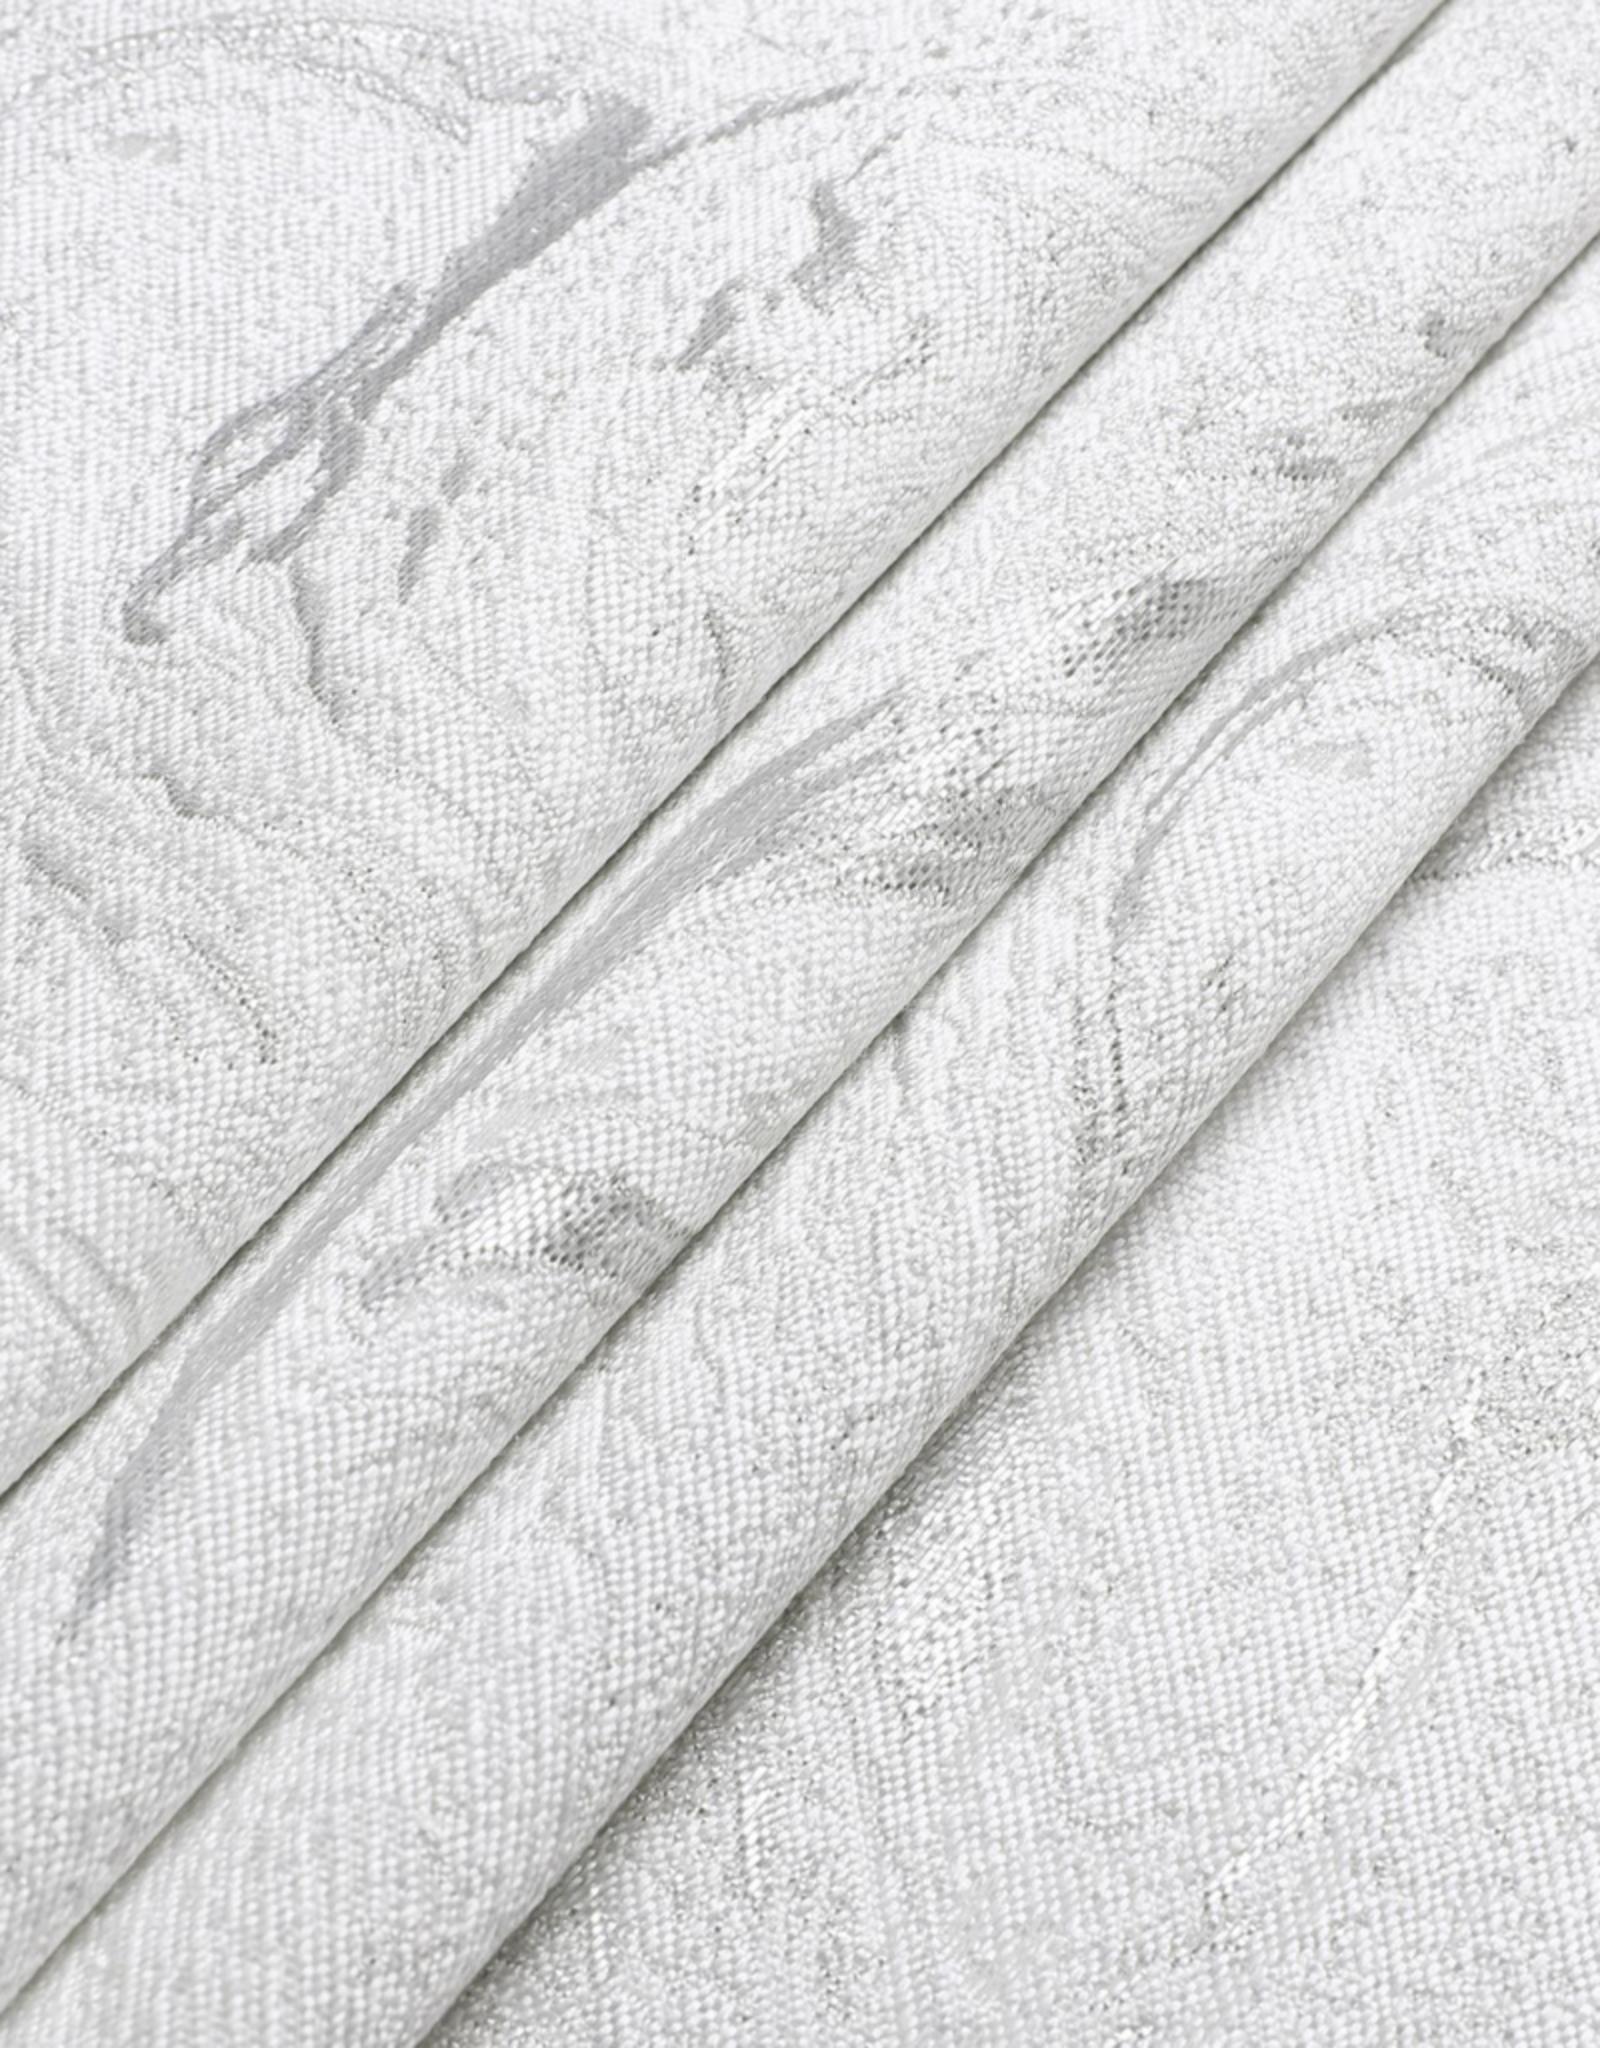 Jacquard White & Silver Wave Tablecloth #1328